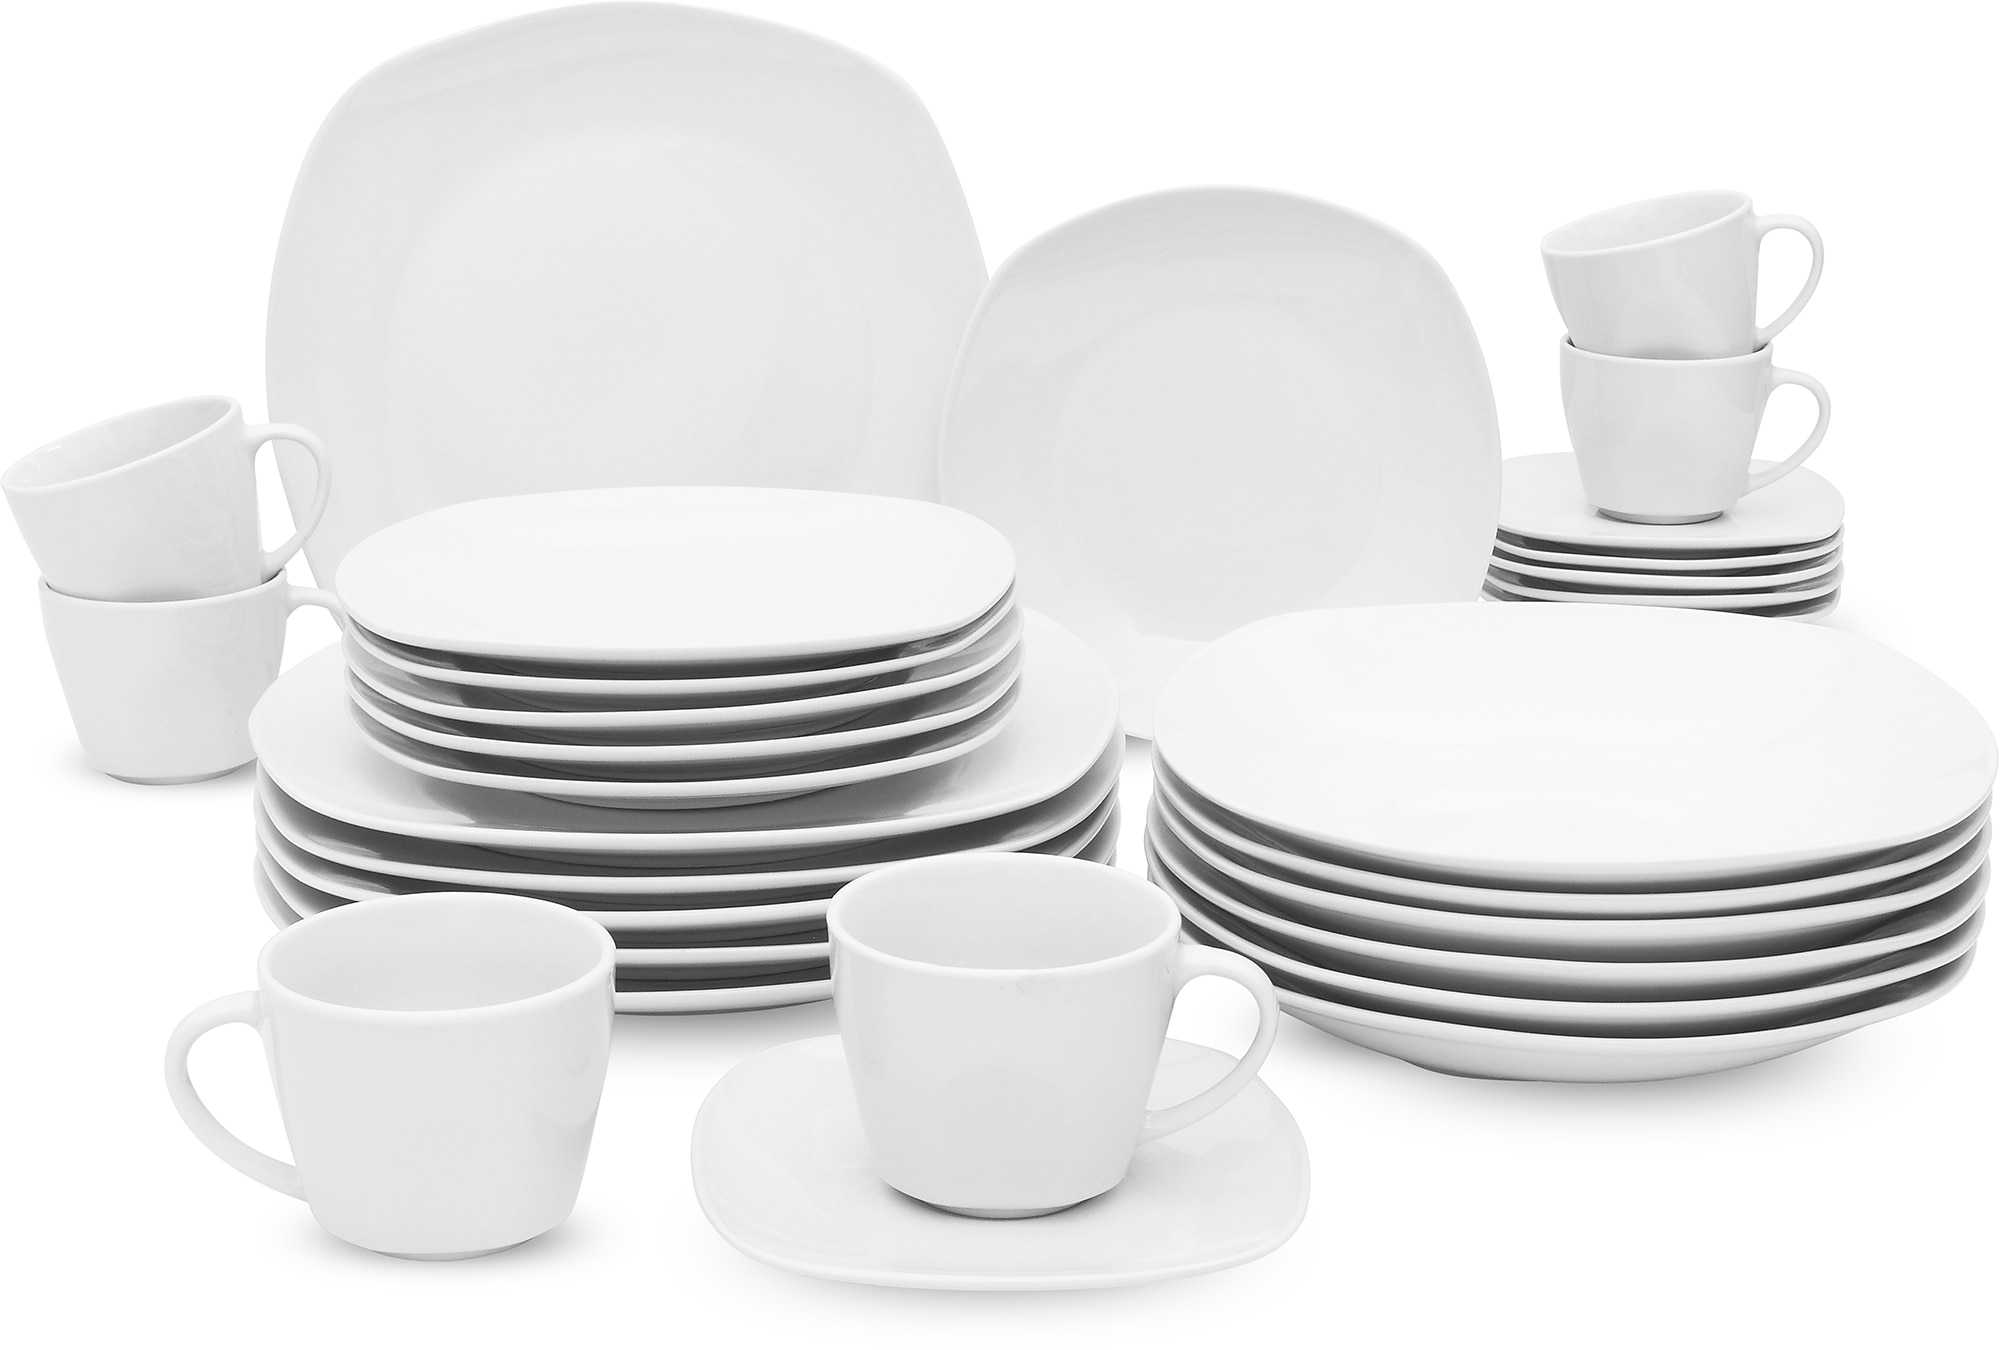 Retsch Arzberg Kombiservice FINO (30-tlg.), Porzellan weiß Geschirr-Sets Geschirr, Tischaccessoires Haushaltswaren